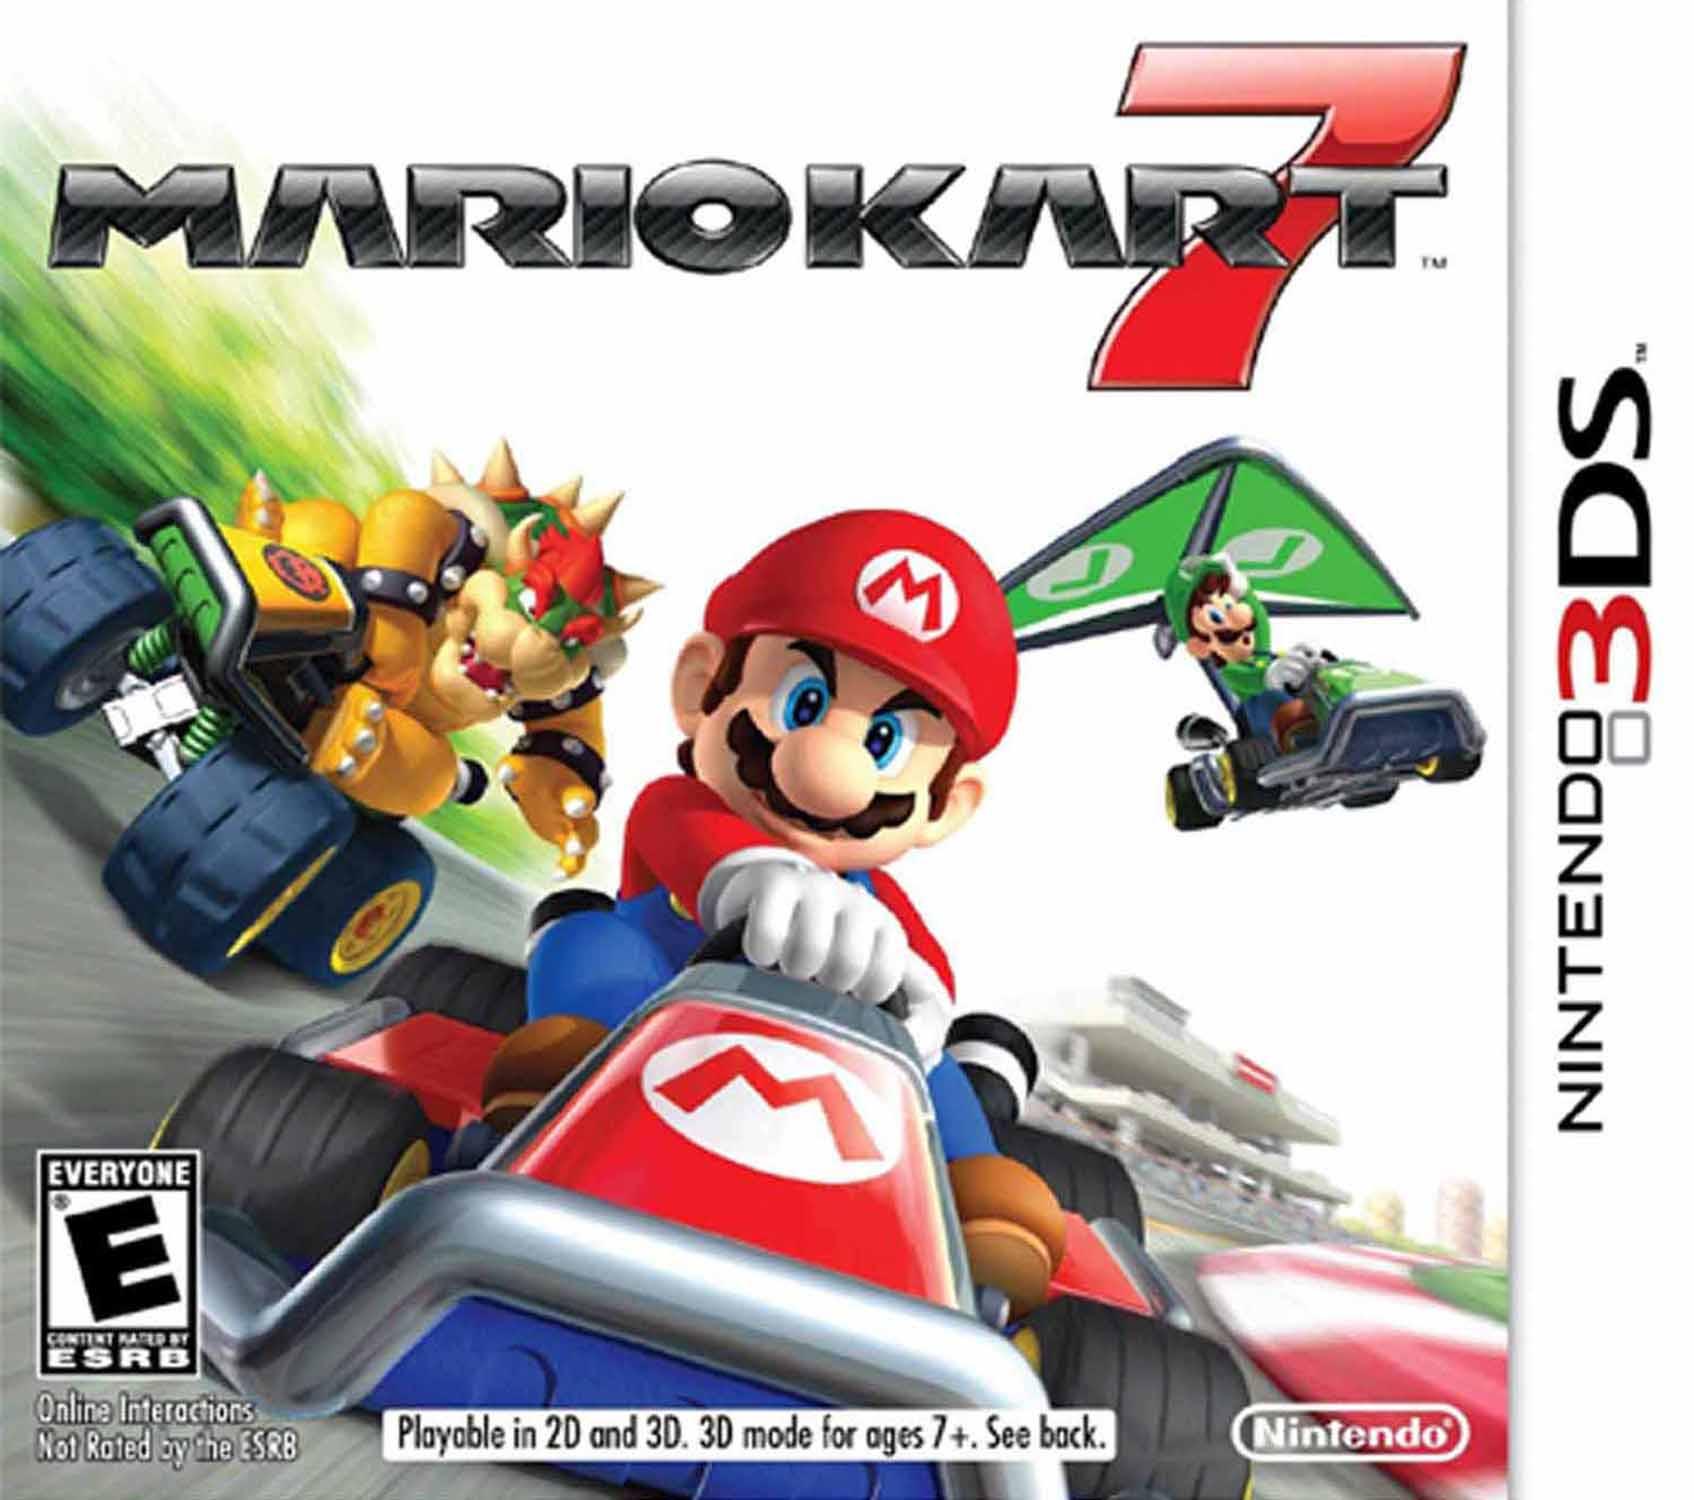 Nintendo 3DS Titles at Walmart B&M - YMMV (Mario Kart 7, Majoras Mask, Super Mario Maker) - $5